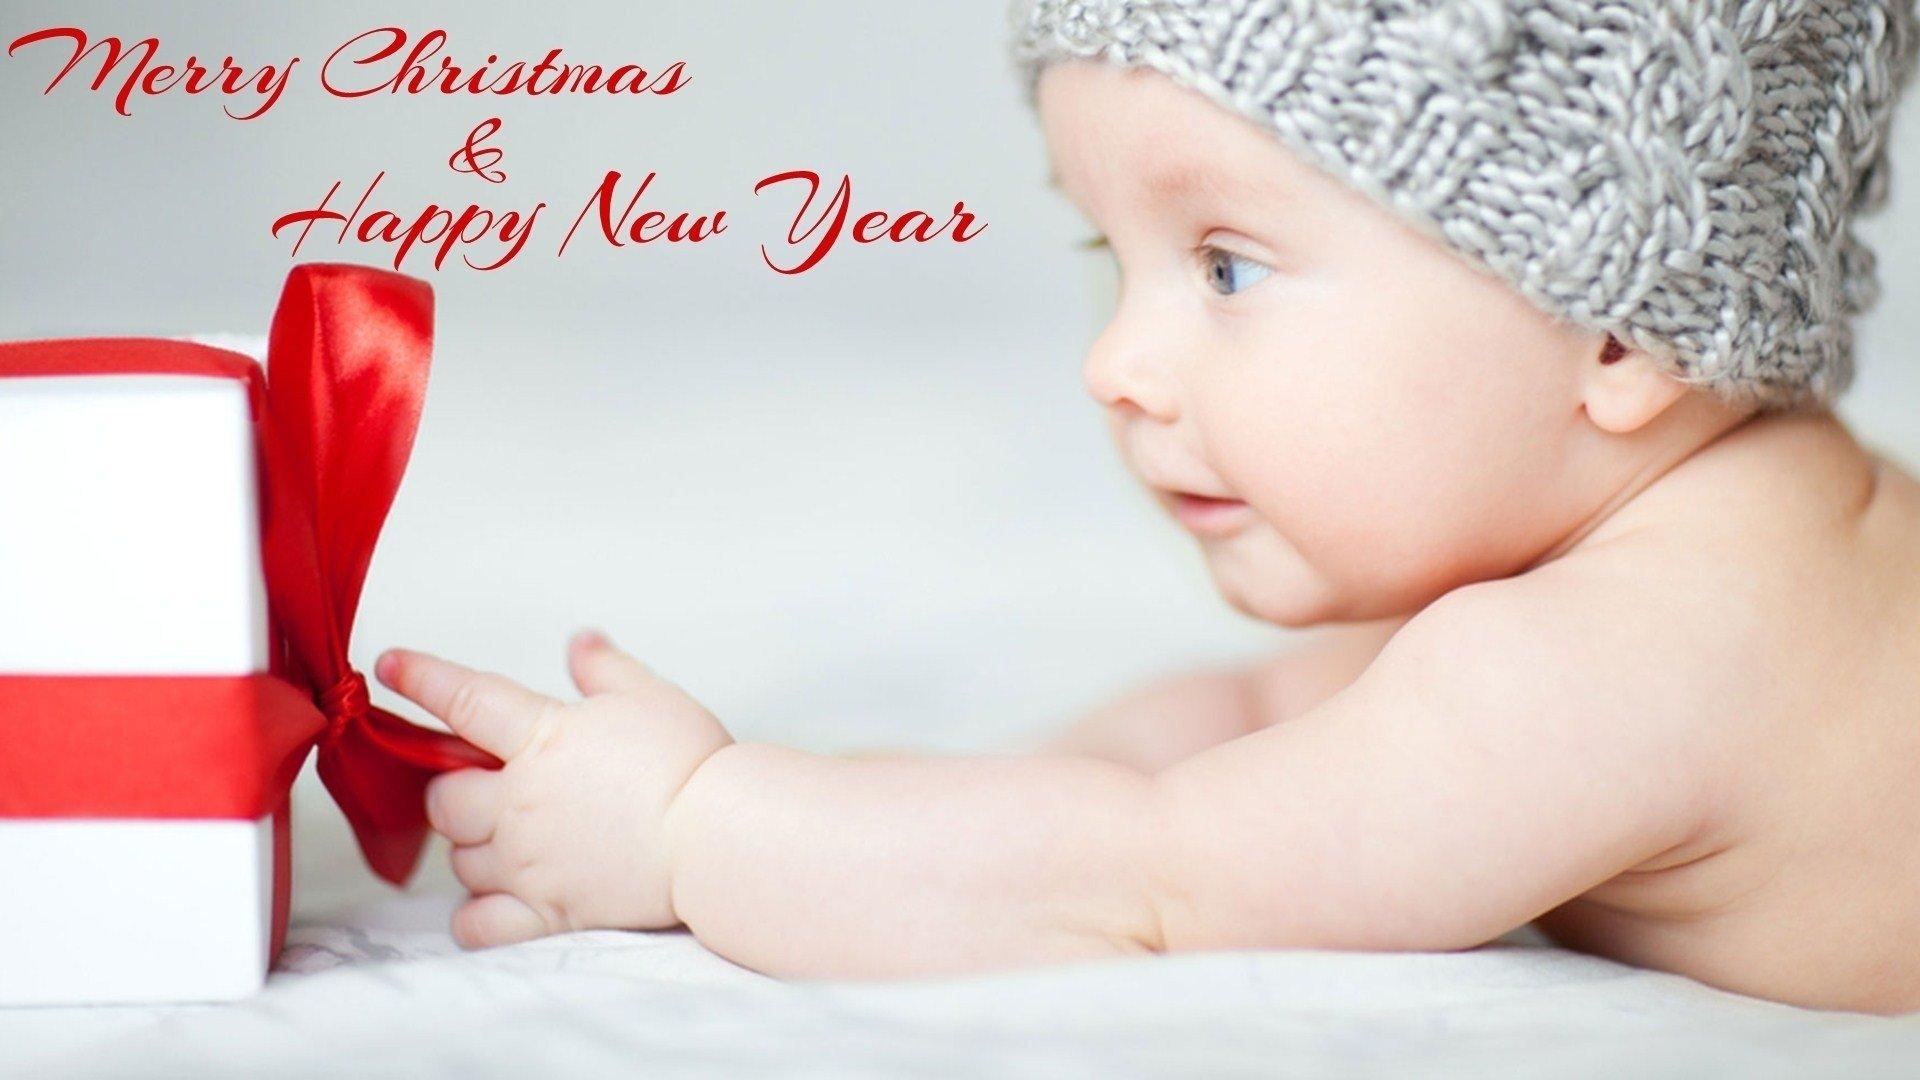 节日 - 圣诞节  婴儿 Hat 礼物 Merry Christmas Happy New Year 元旦 壁纸